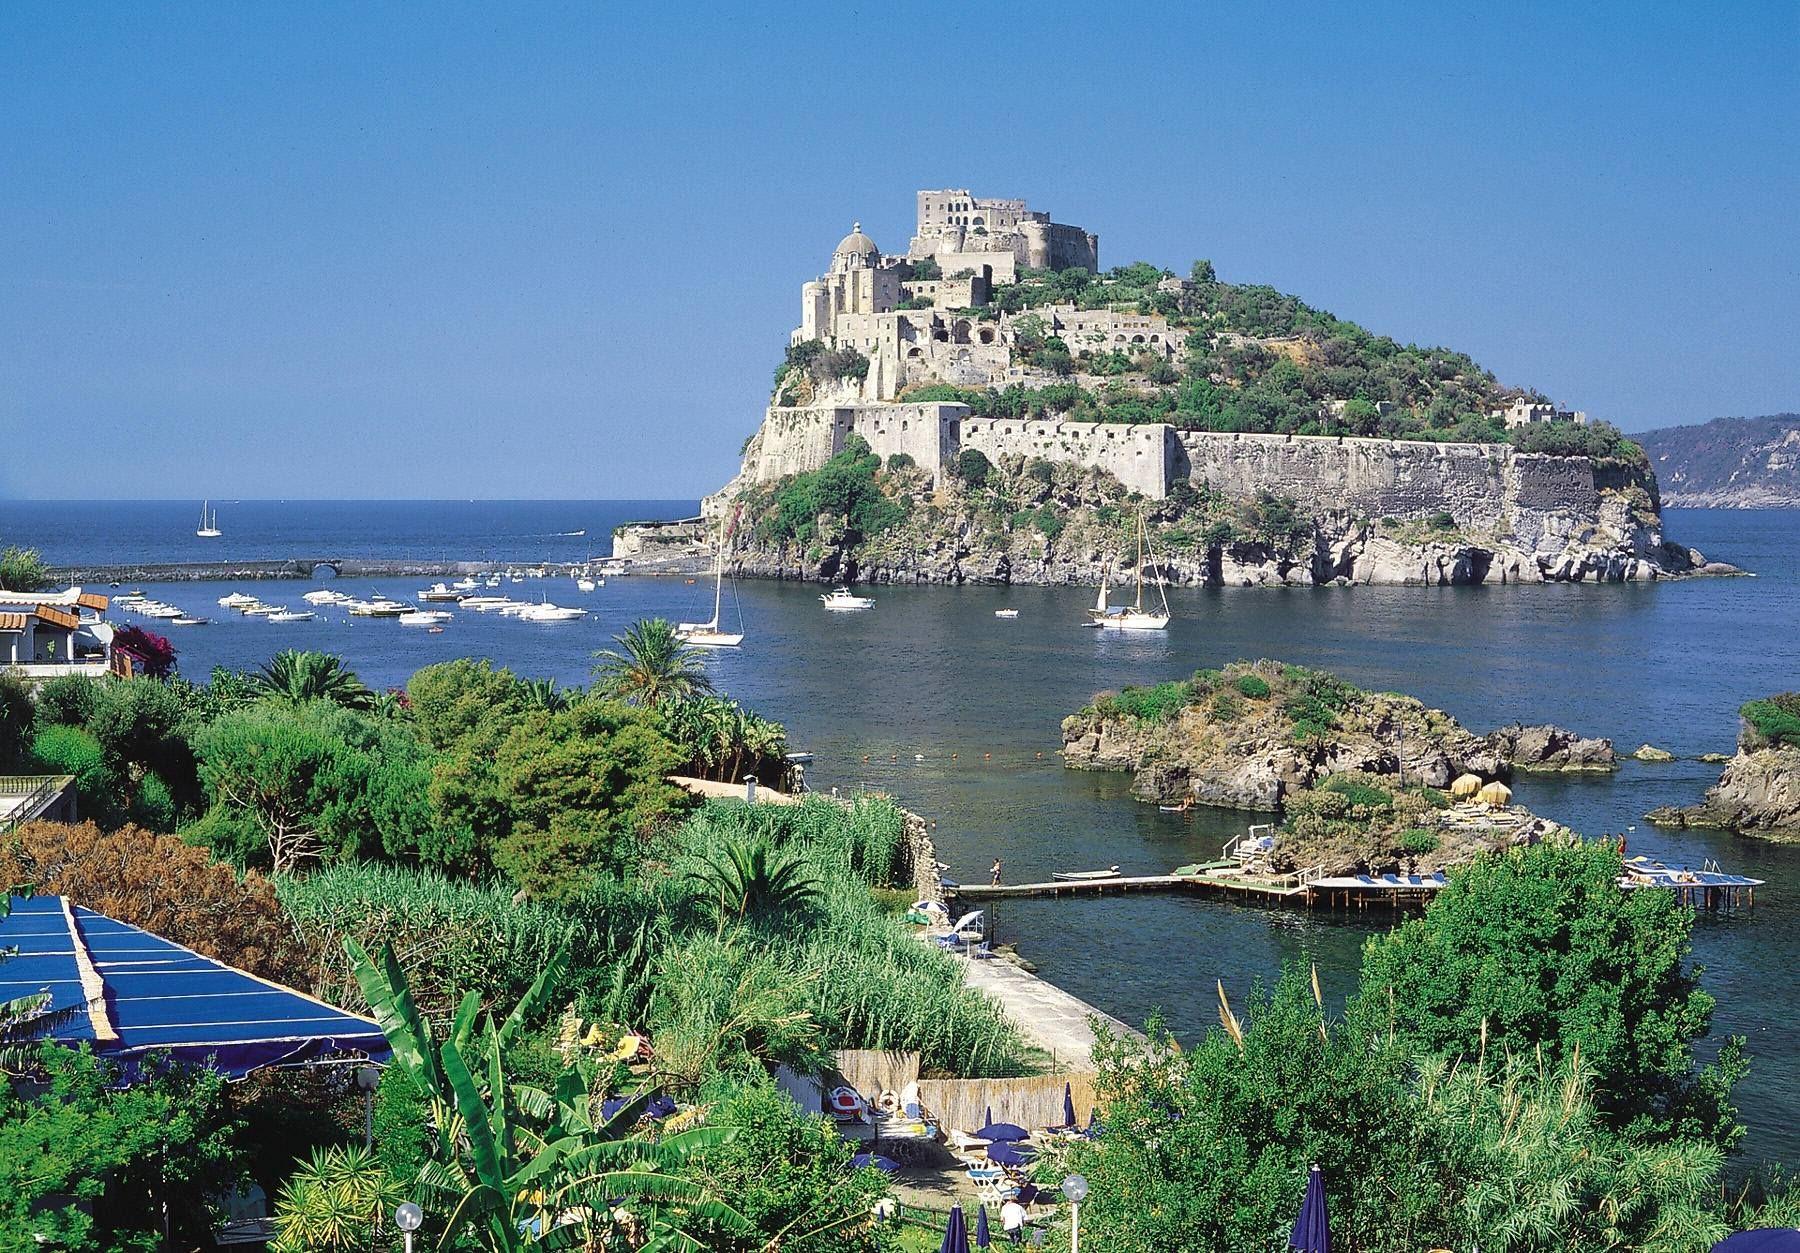 Capri Panorama Faraglioni Tyrrhenian Sea Bay Of Naples ... |Capri Italy Golf